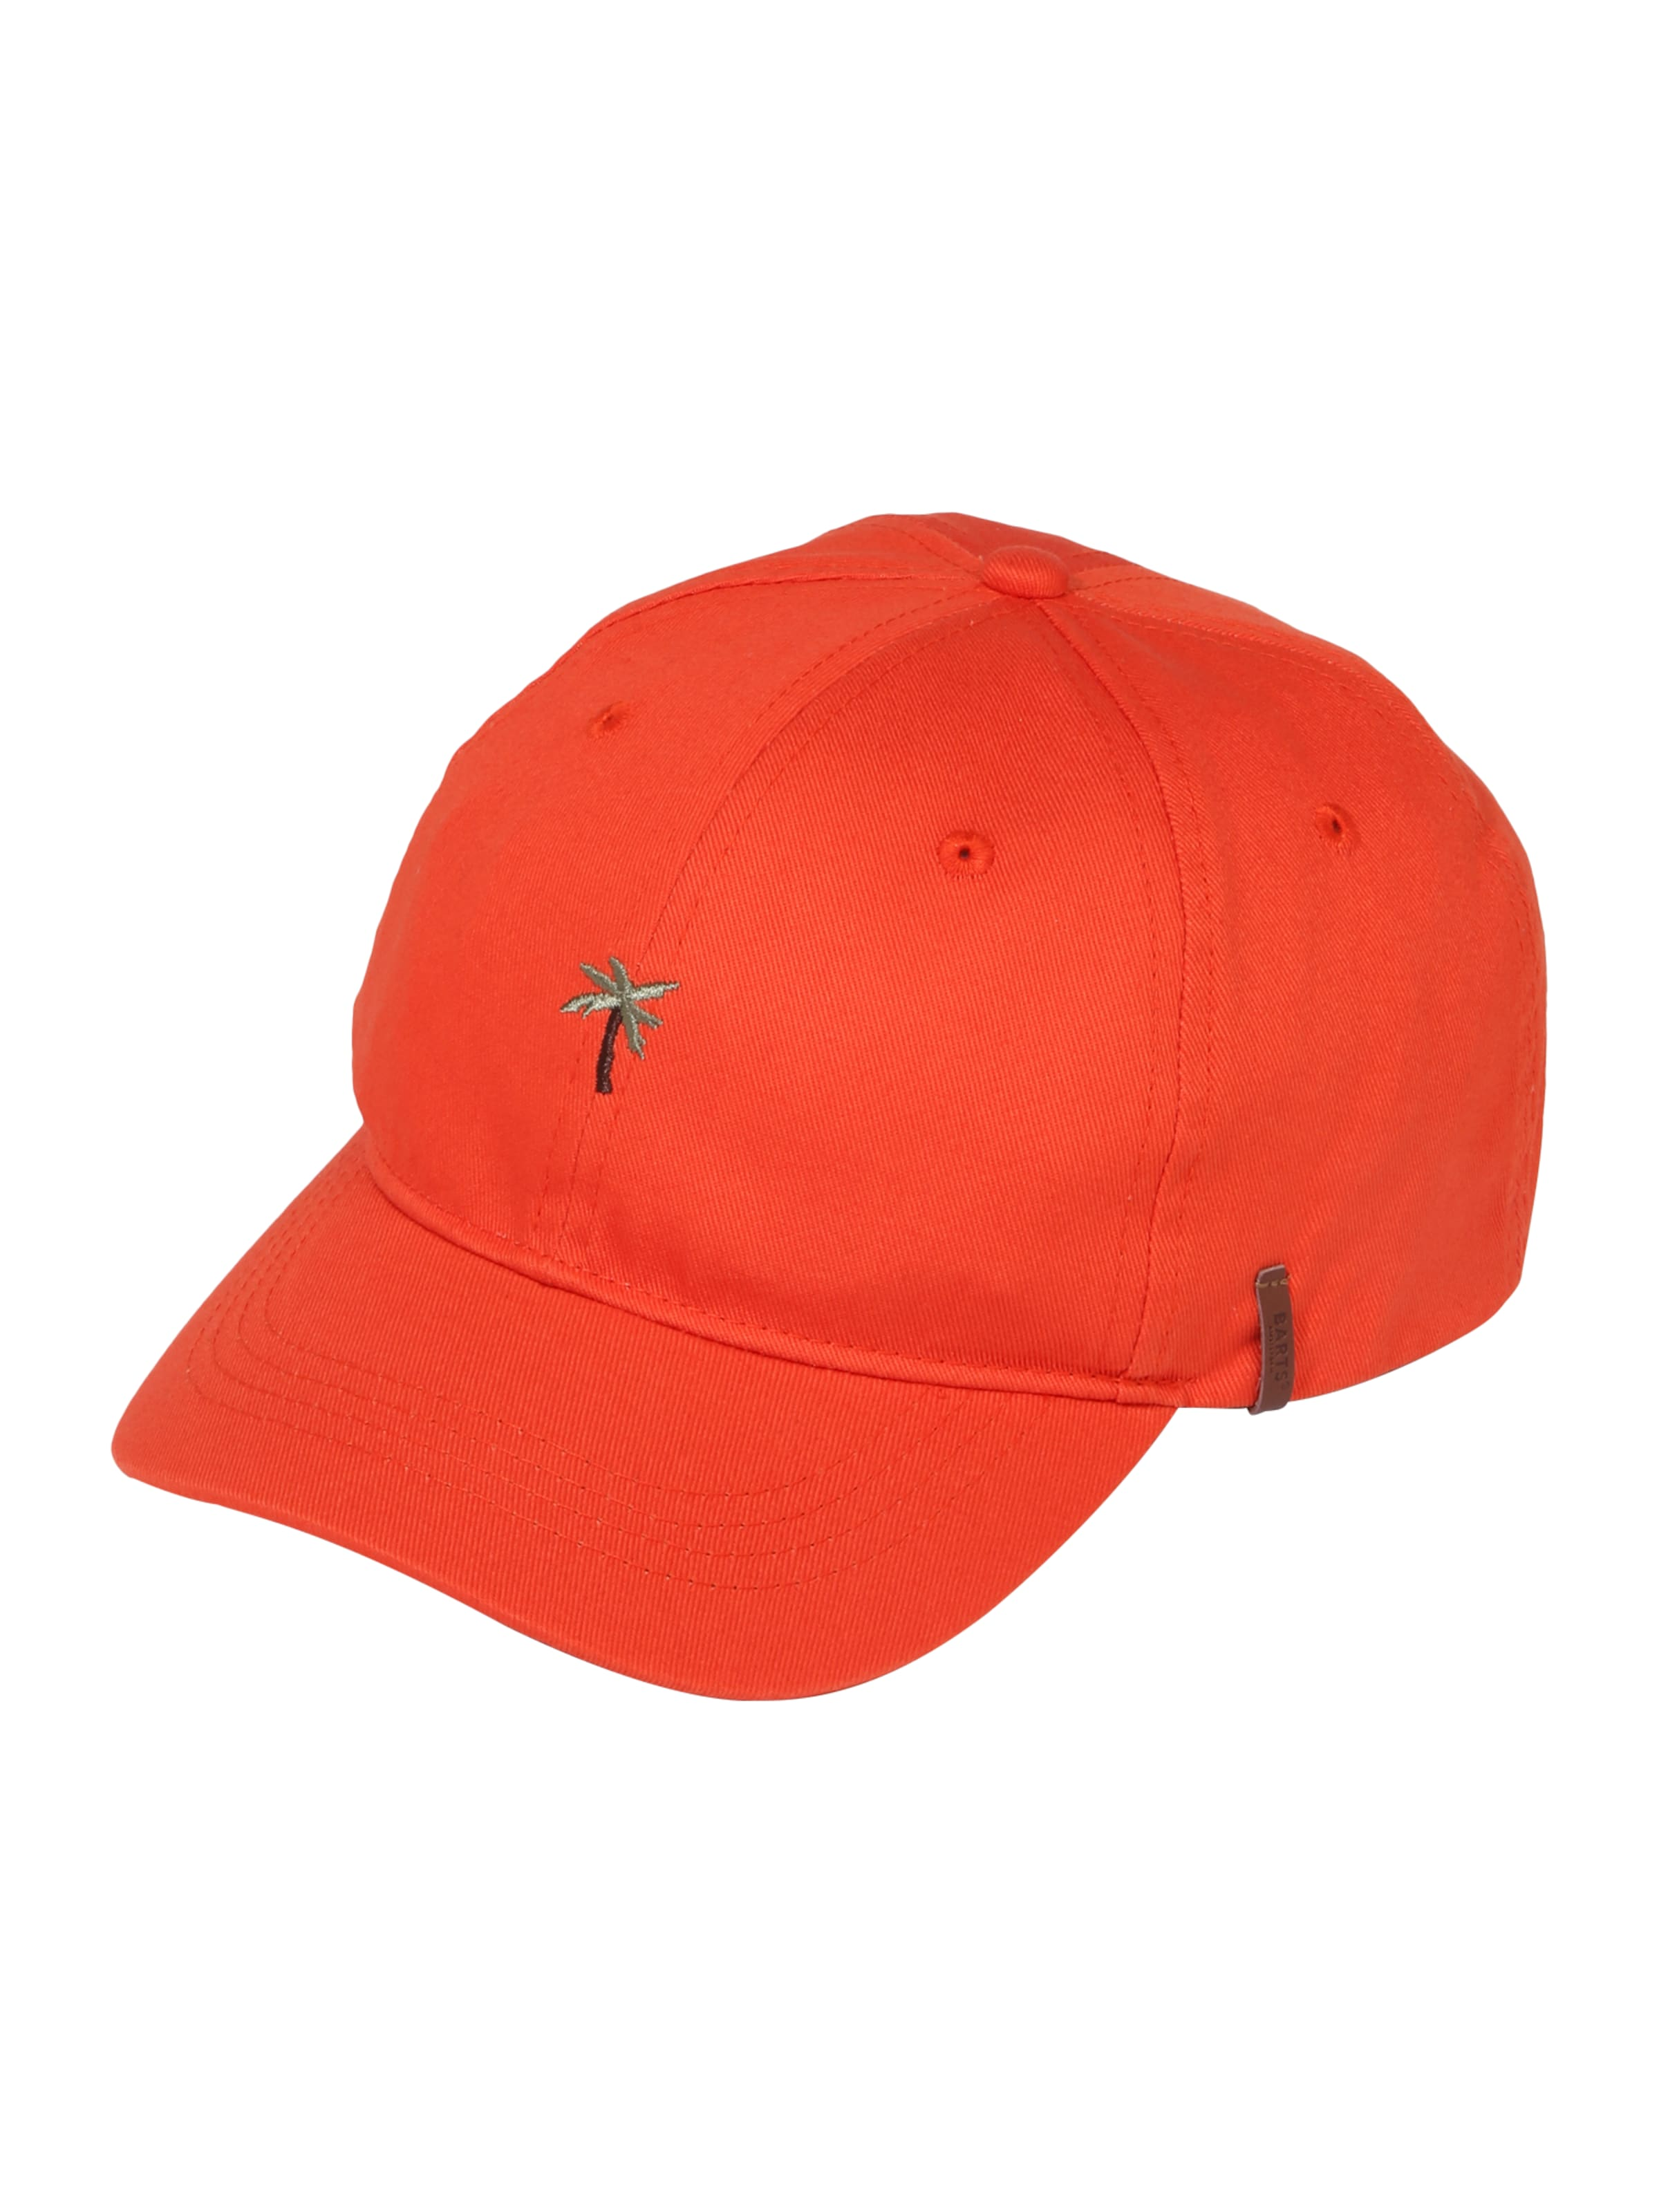 In Cap Orangerot 'posse' Orangerot Barts Barts Barts 'posse' Cap In QdtBshrxCo